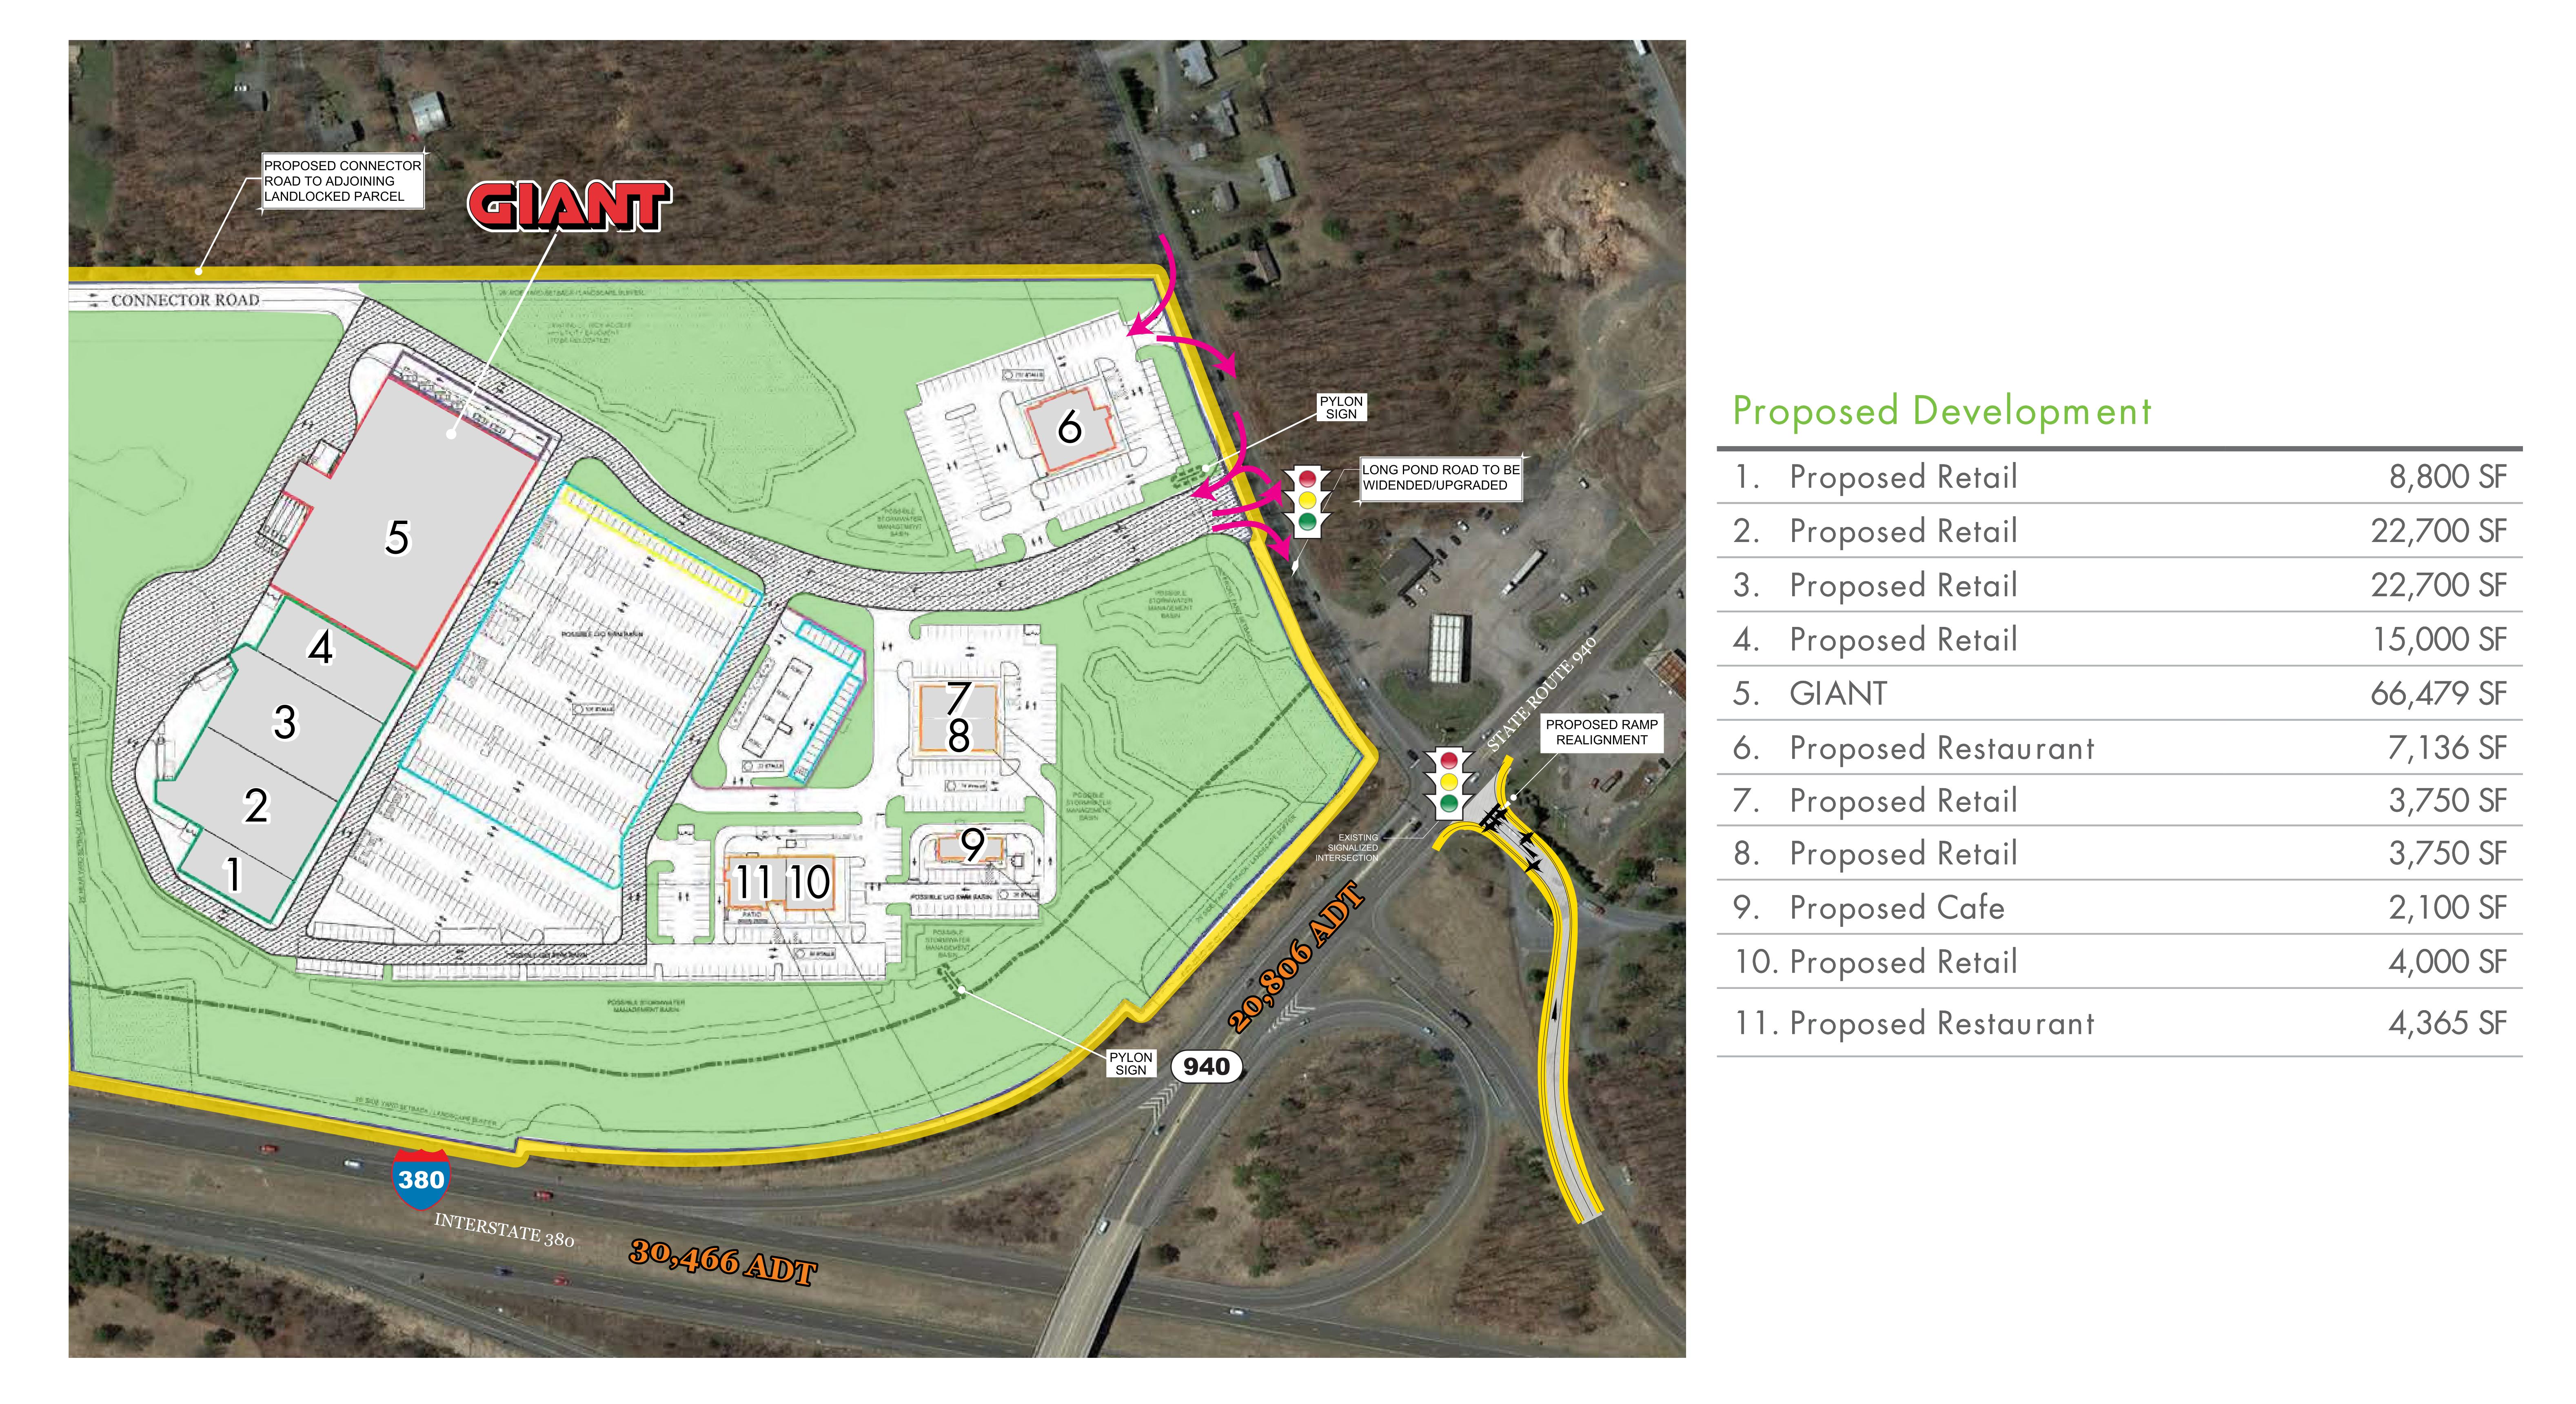 Route 940 & I-380 Interchange: site plan